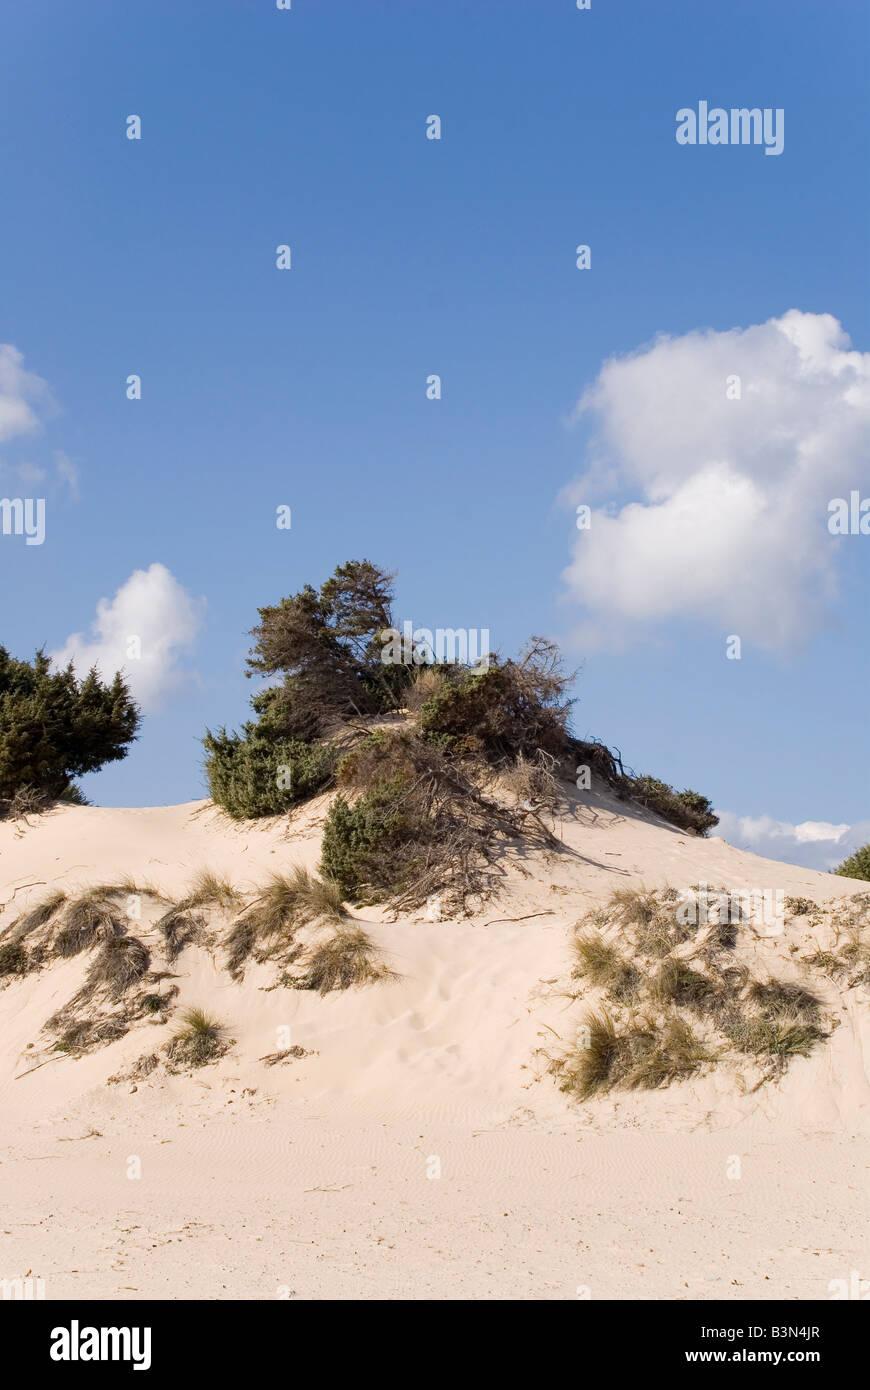 Italy, Sardinia, Sand dunes and grass - Stock Image